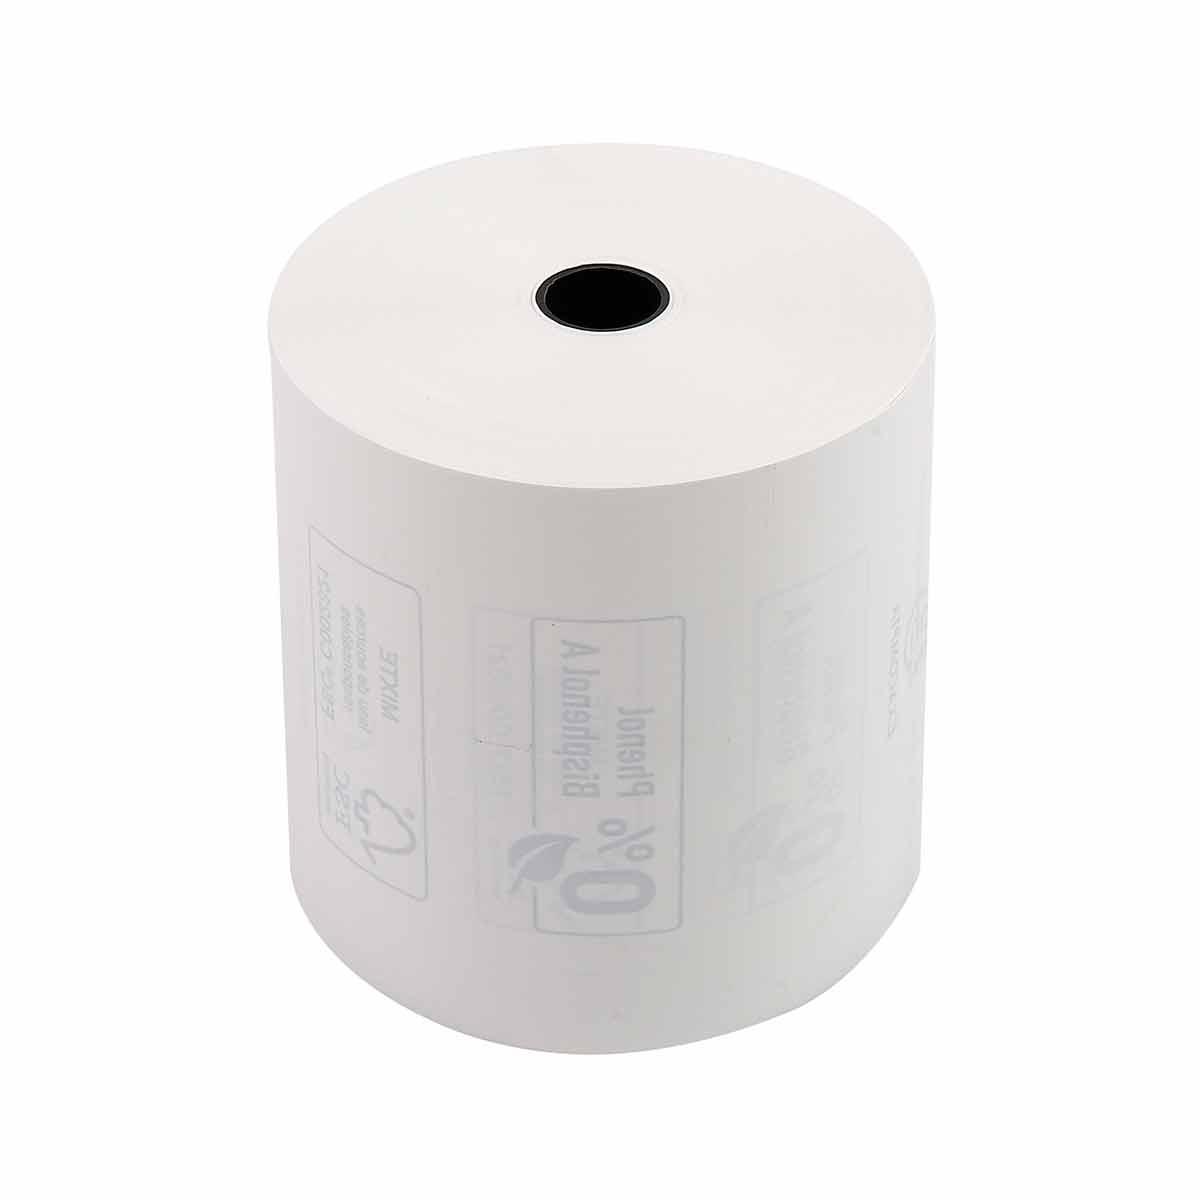 Exacompta Thermal Receipt Rolls Phenol-Free 80x80x12mm 3 Packs of 10